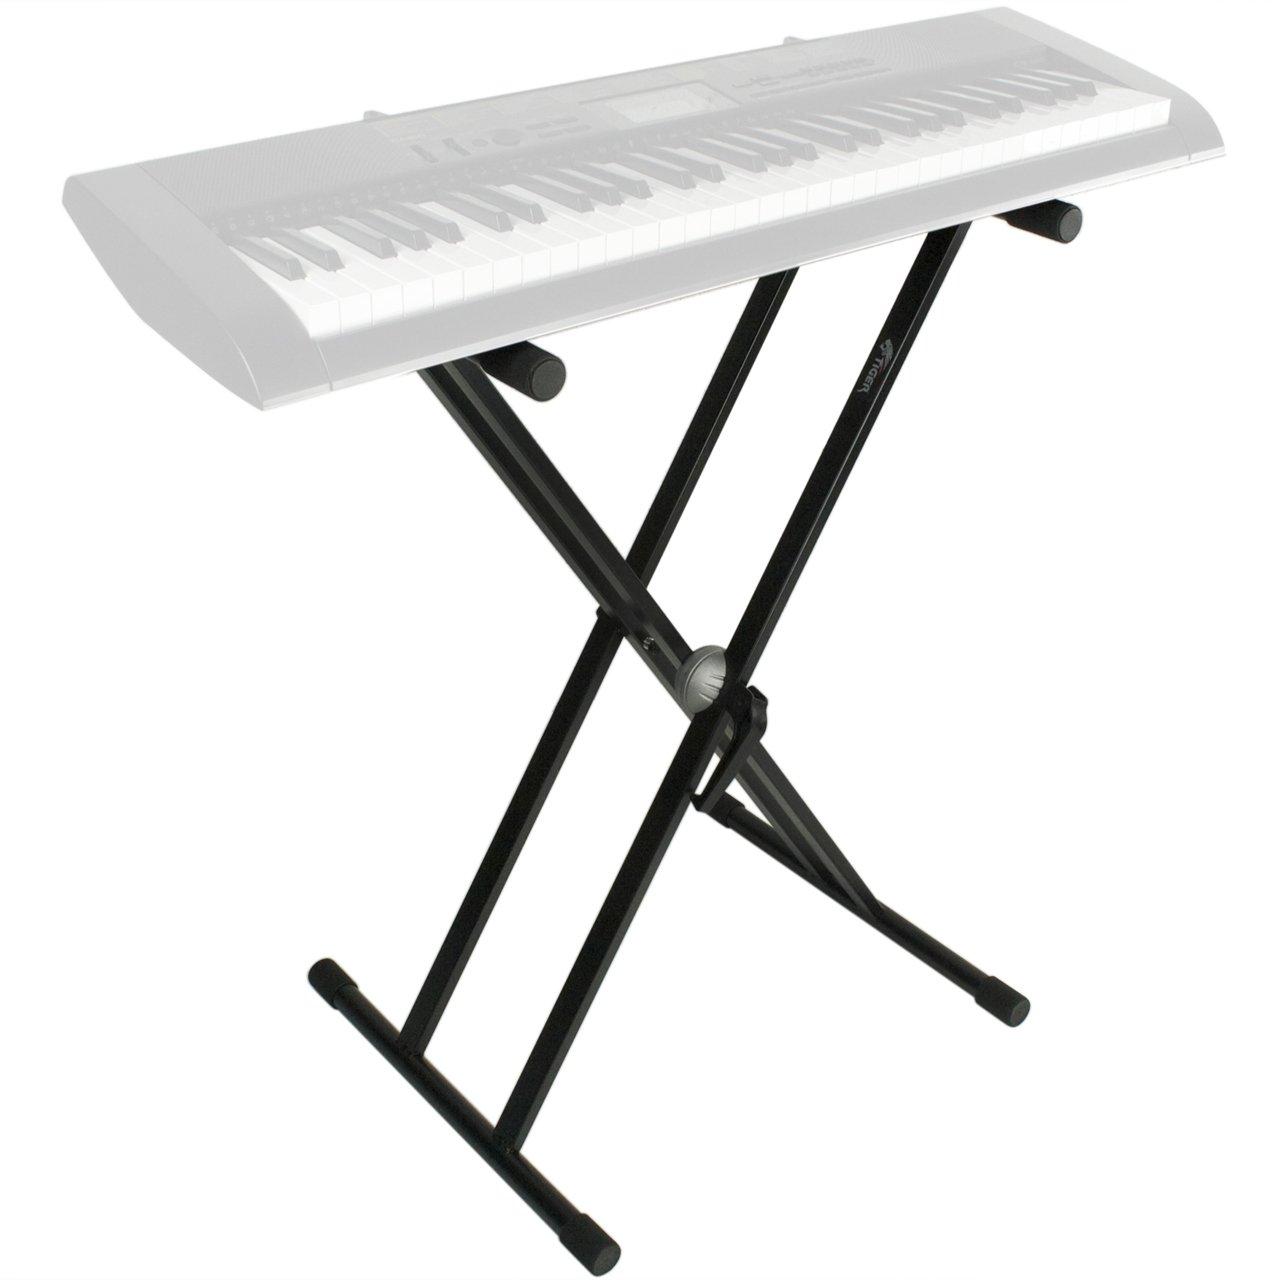 Tiger KYS14-BK Doppel-Keyboardständer - Schwarz: Amazon.de ...